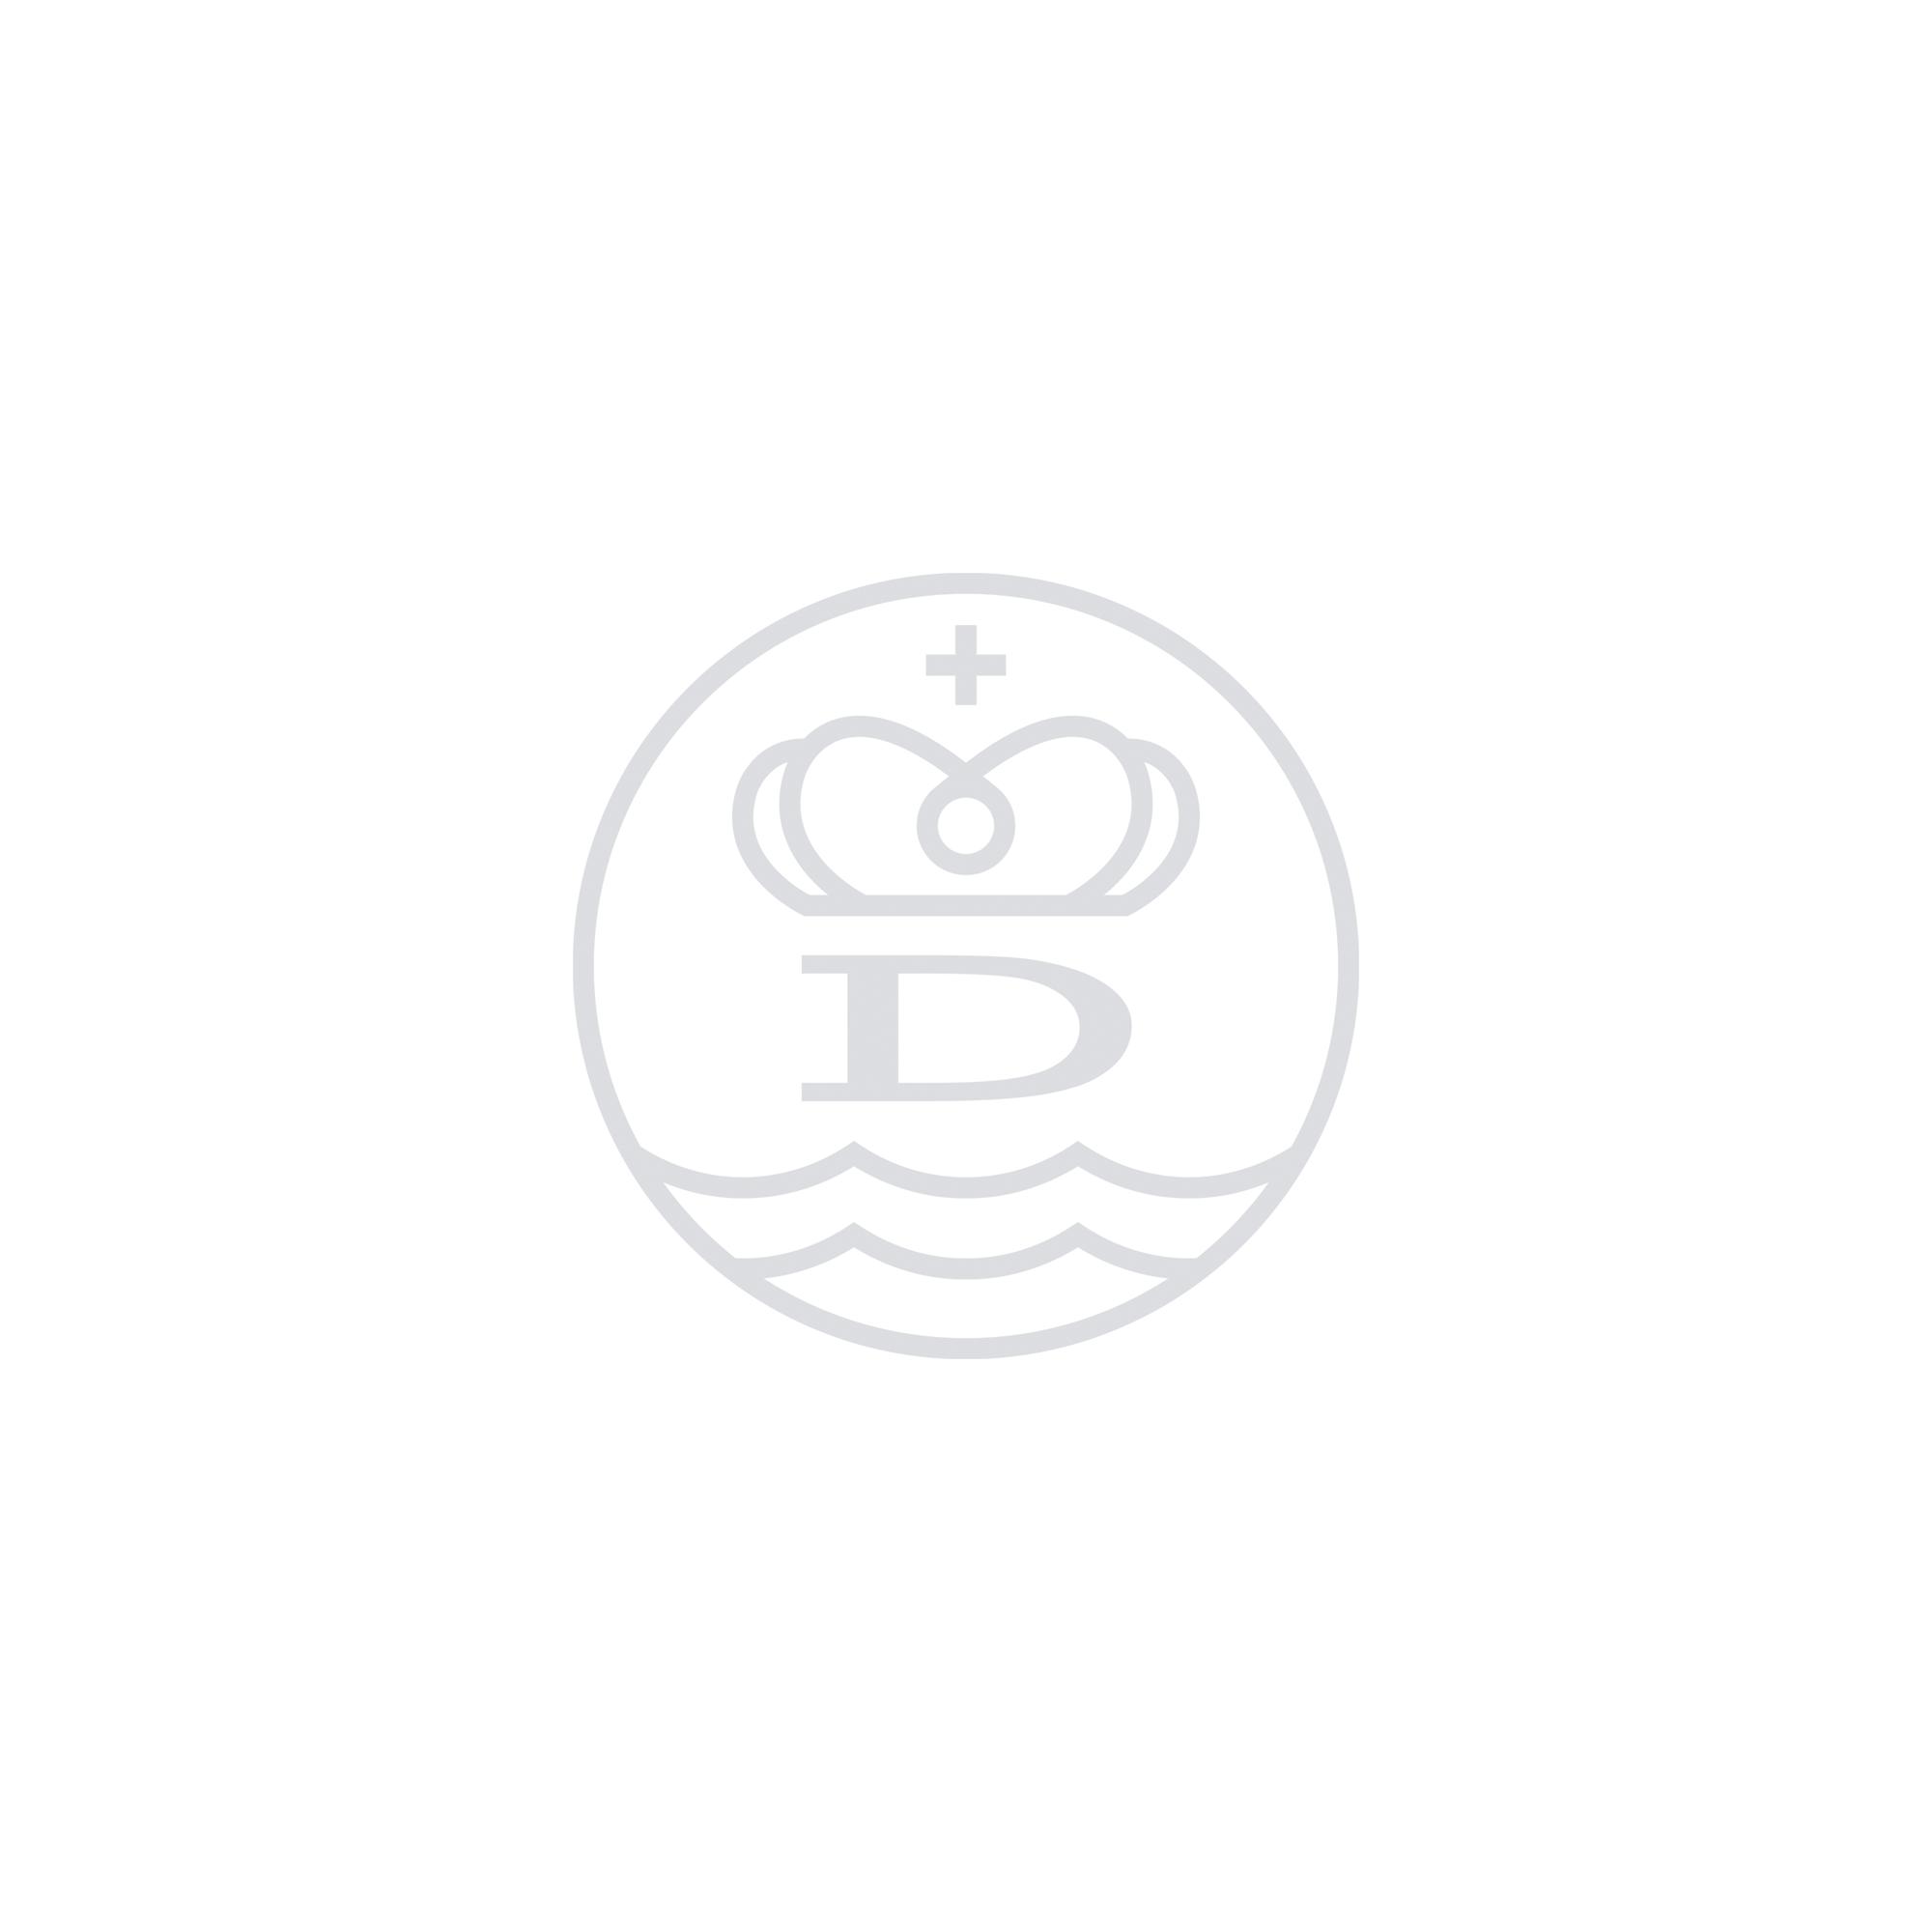 Gold Midi Bowness Acorn Bangle detailed